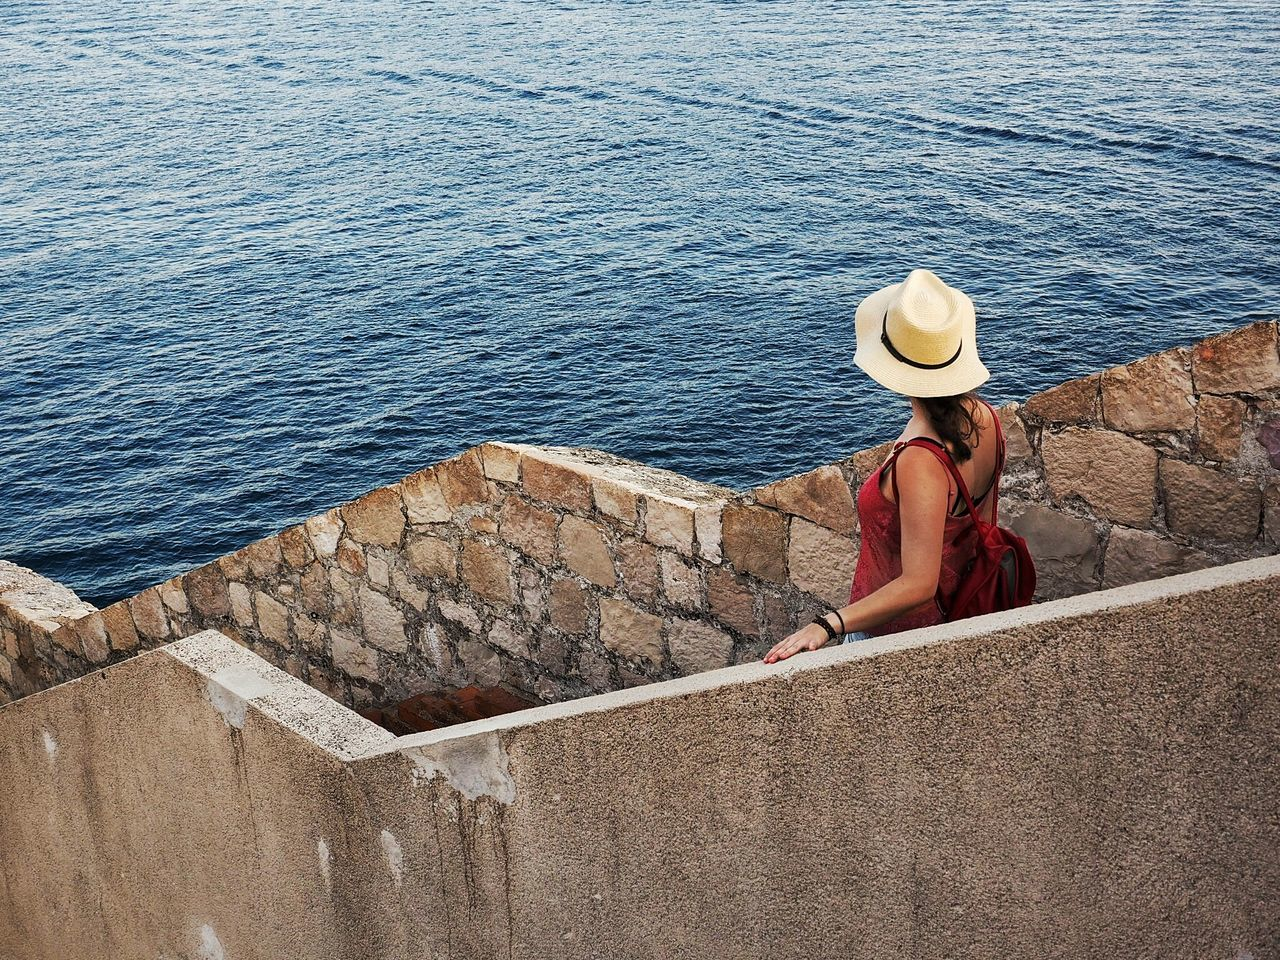 Beautiful stock photos of walk, Built Structure, Casual Clothing, Croatia, Day